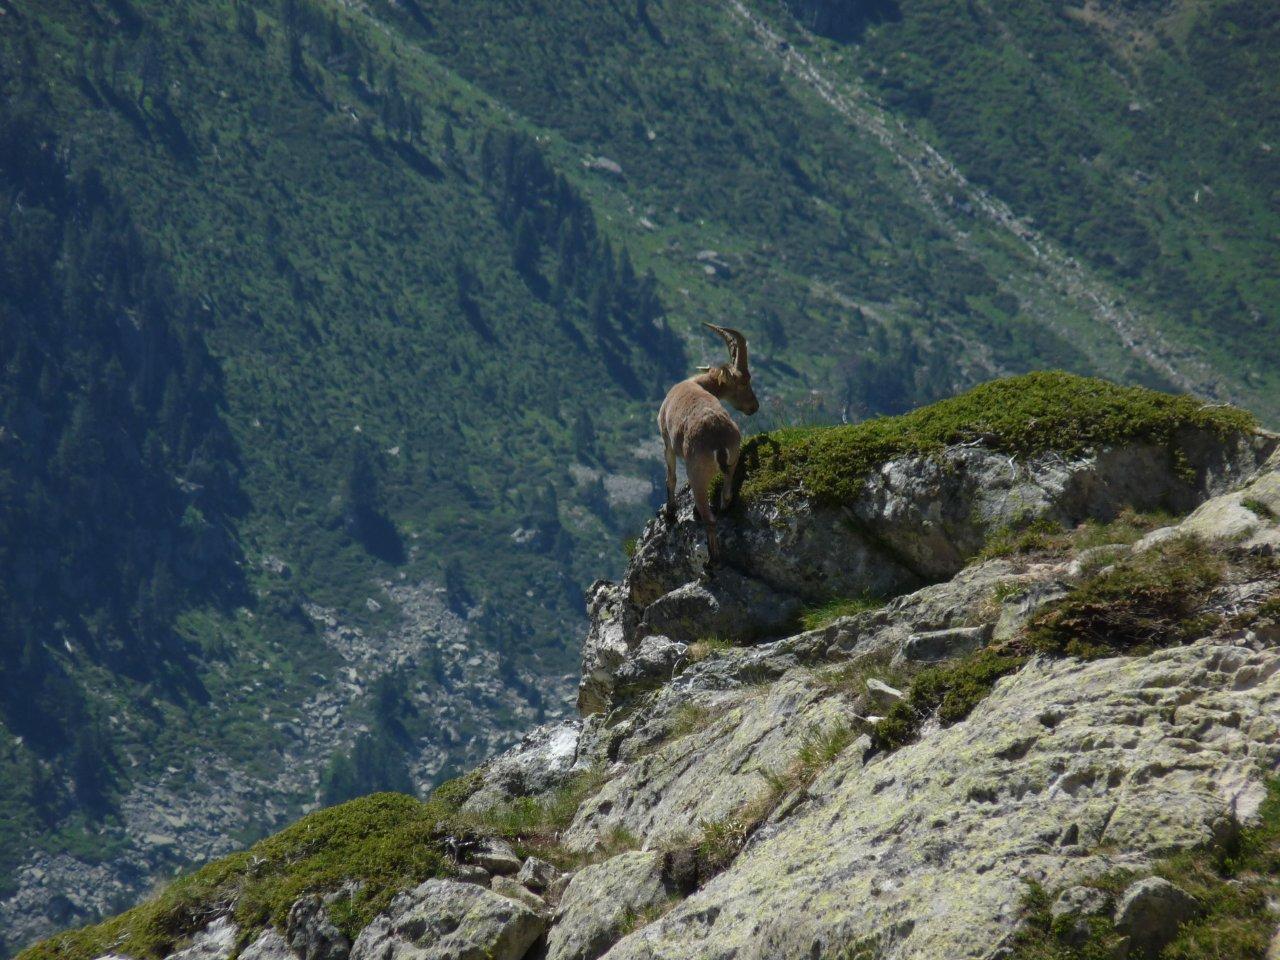 Rayo © S.Guichemer - Parc national des Pyrénées